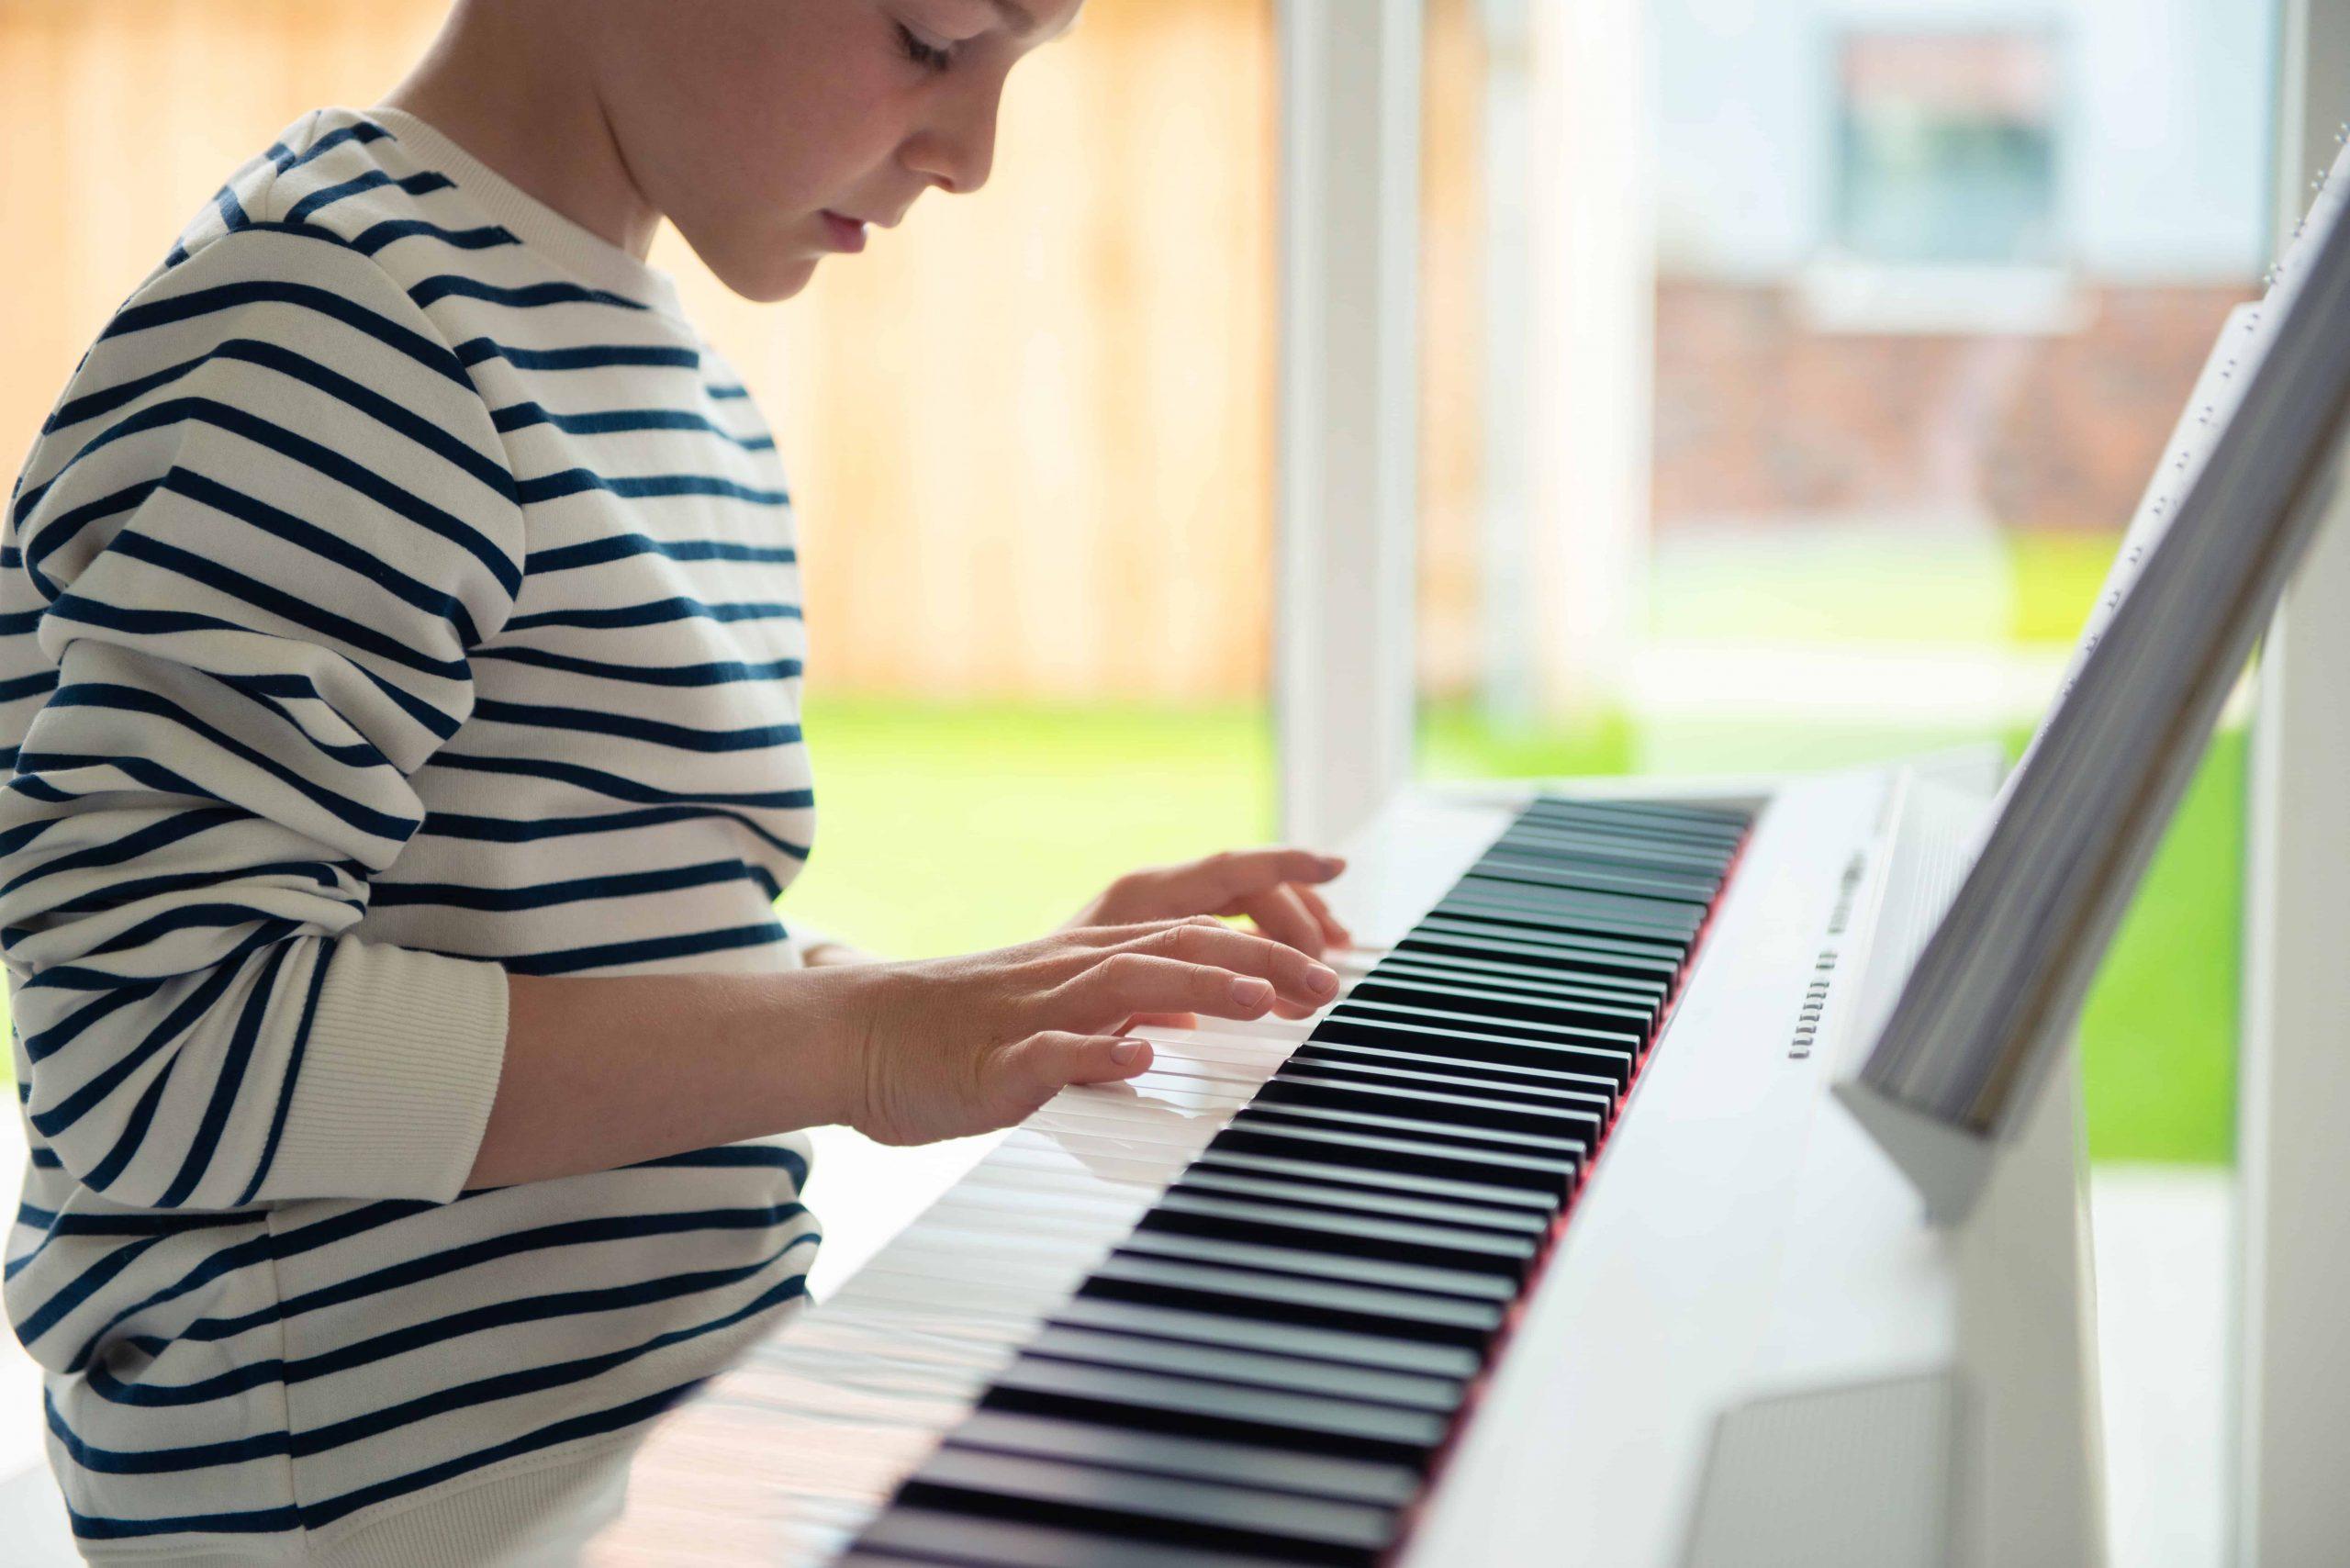 E-Piano: Test & Empfehlungen (10/20)